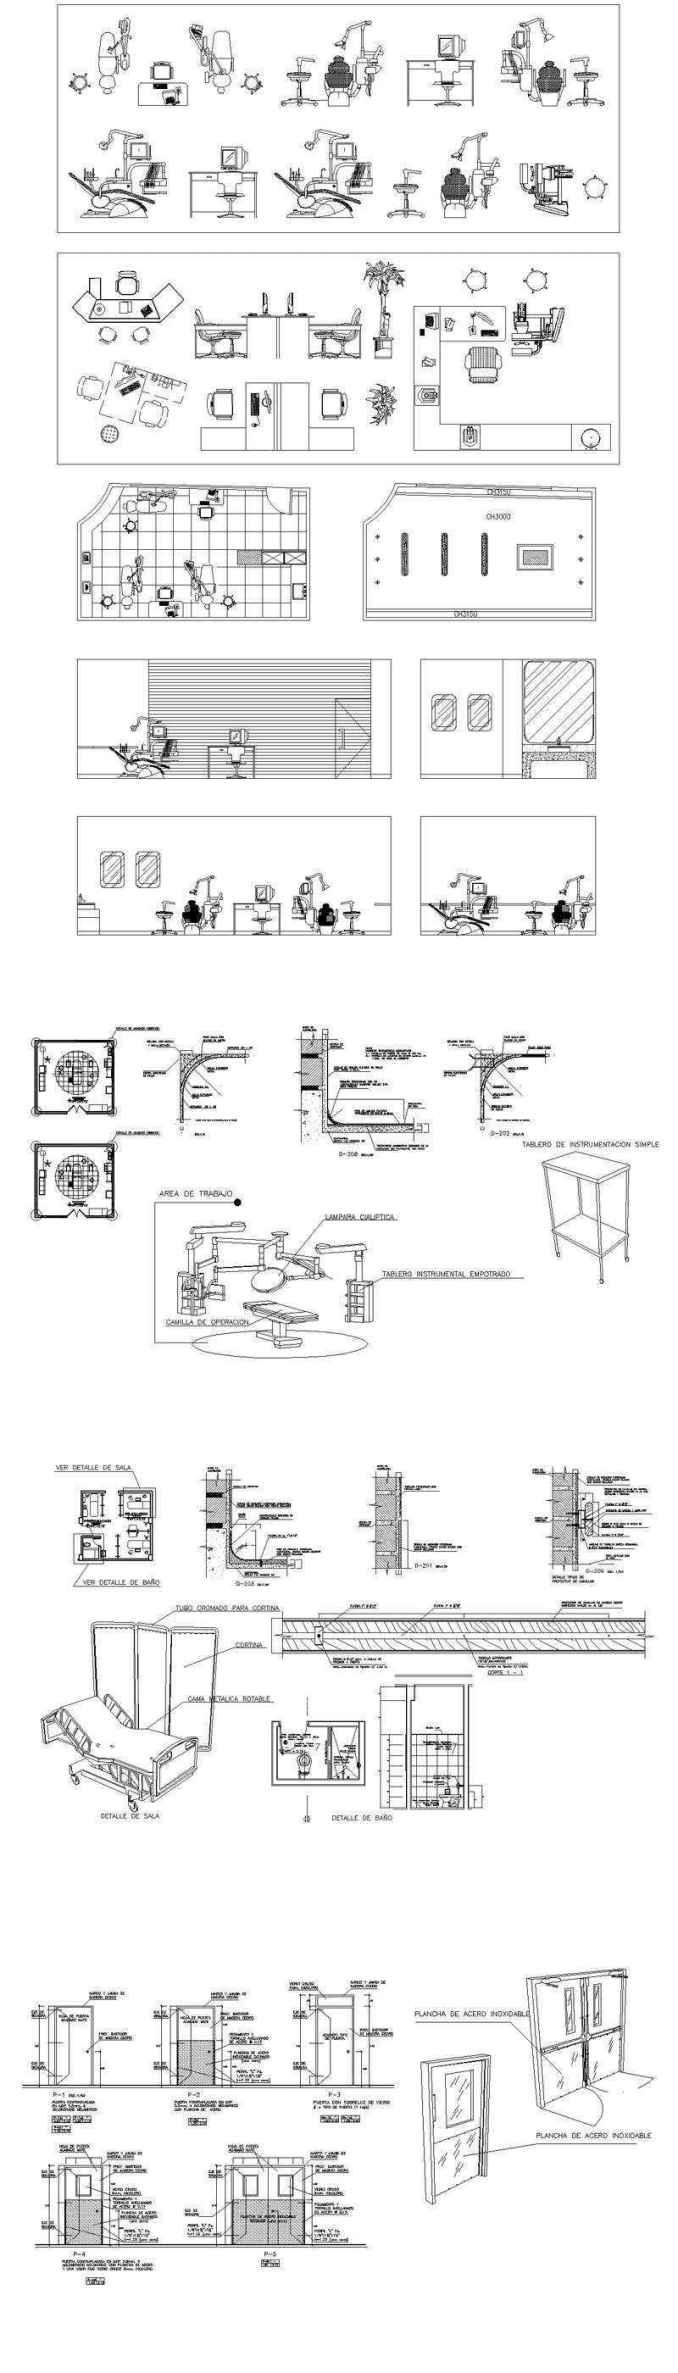 Cinema Design,Autocad Blocks,Cinema Details,Cinema Section,Cinema elevation